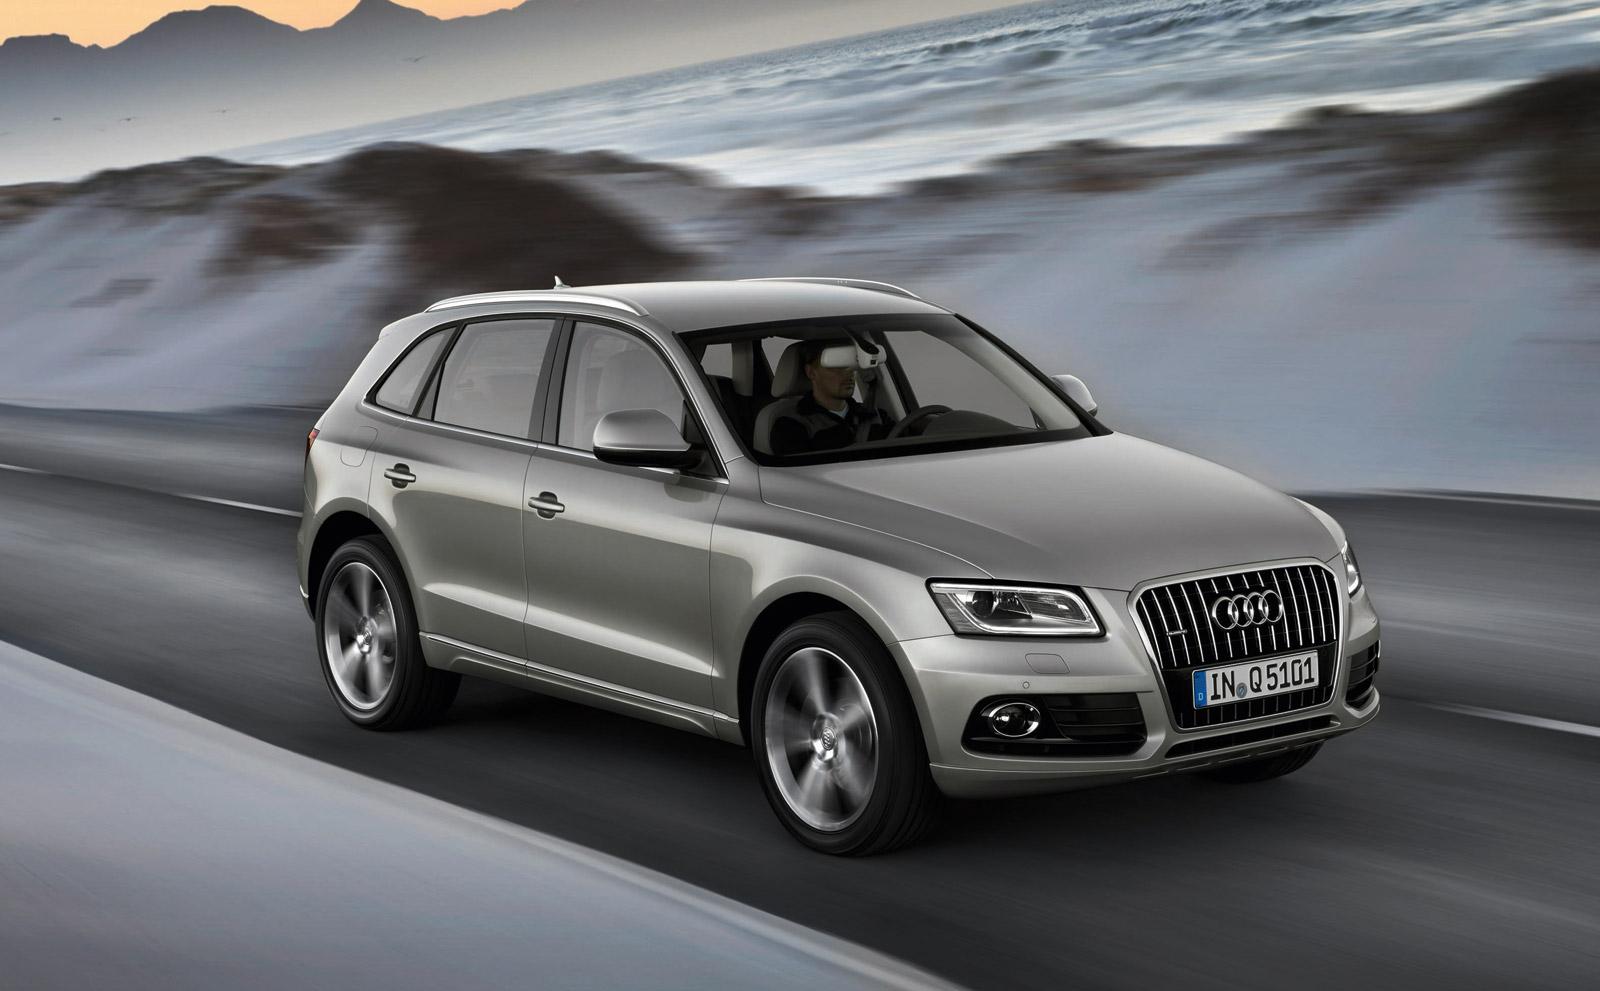 2013 Audi Q5 Preview